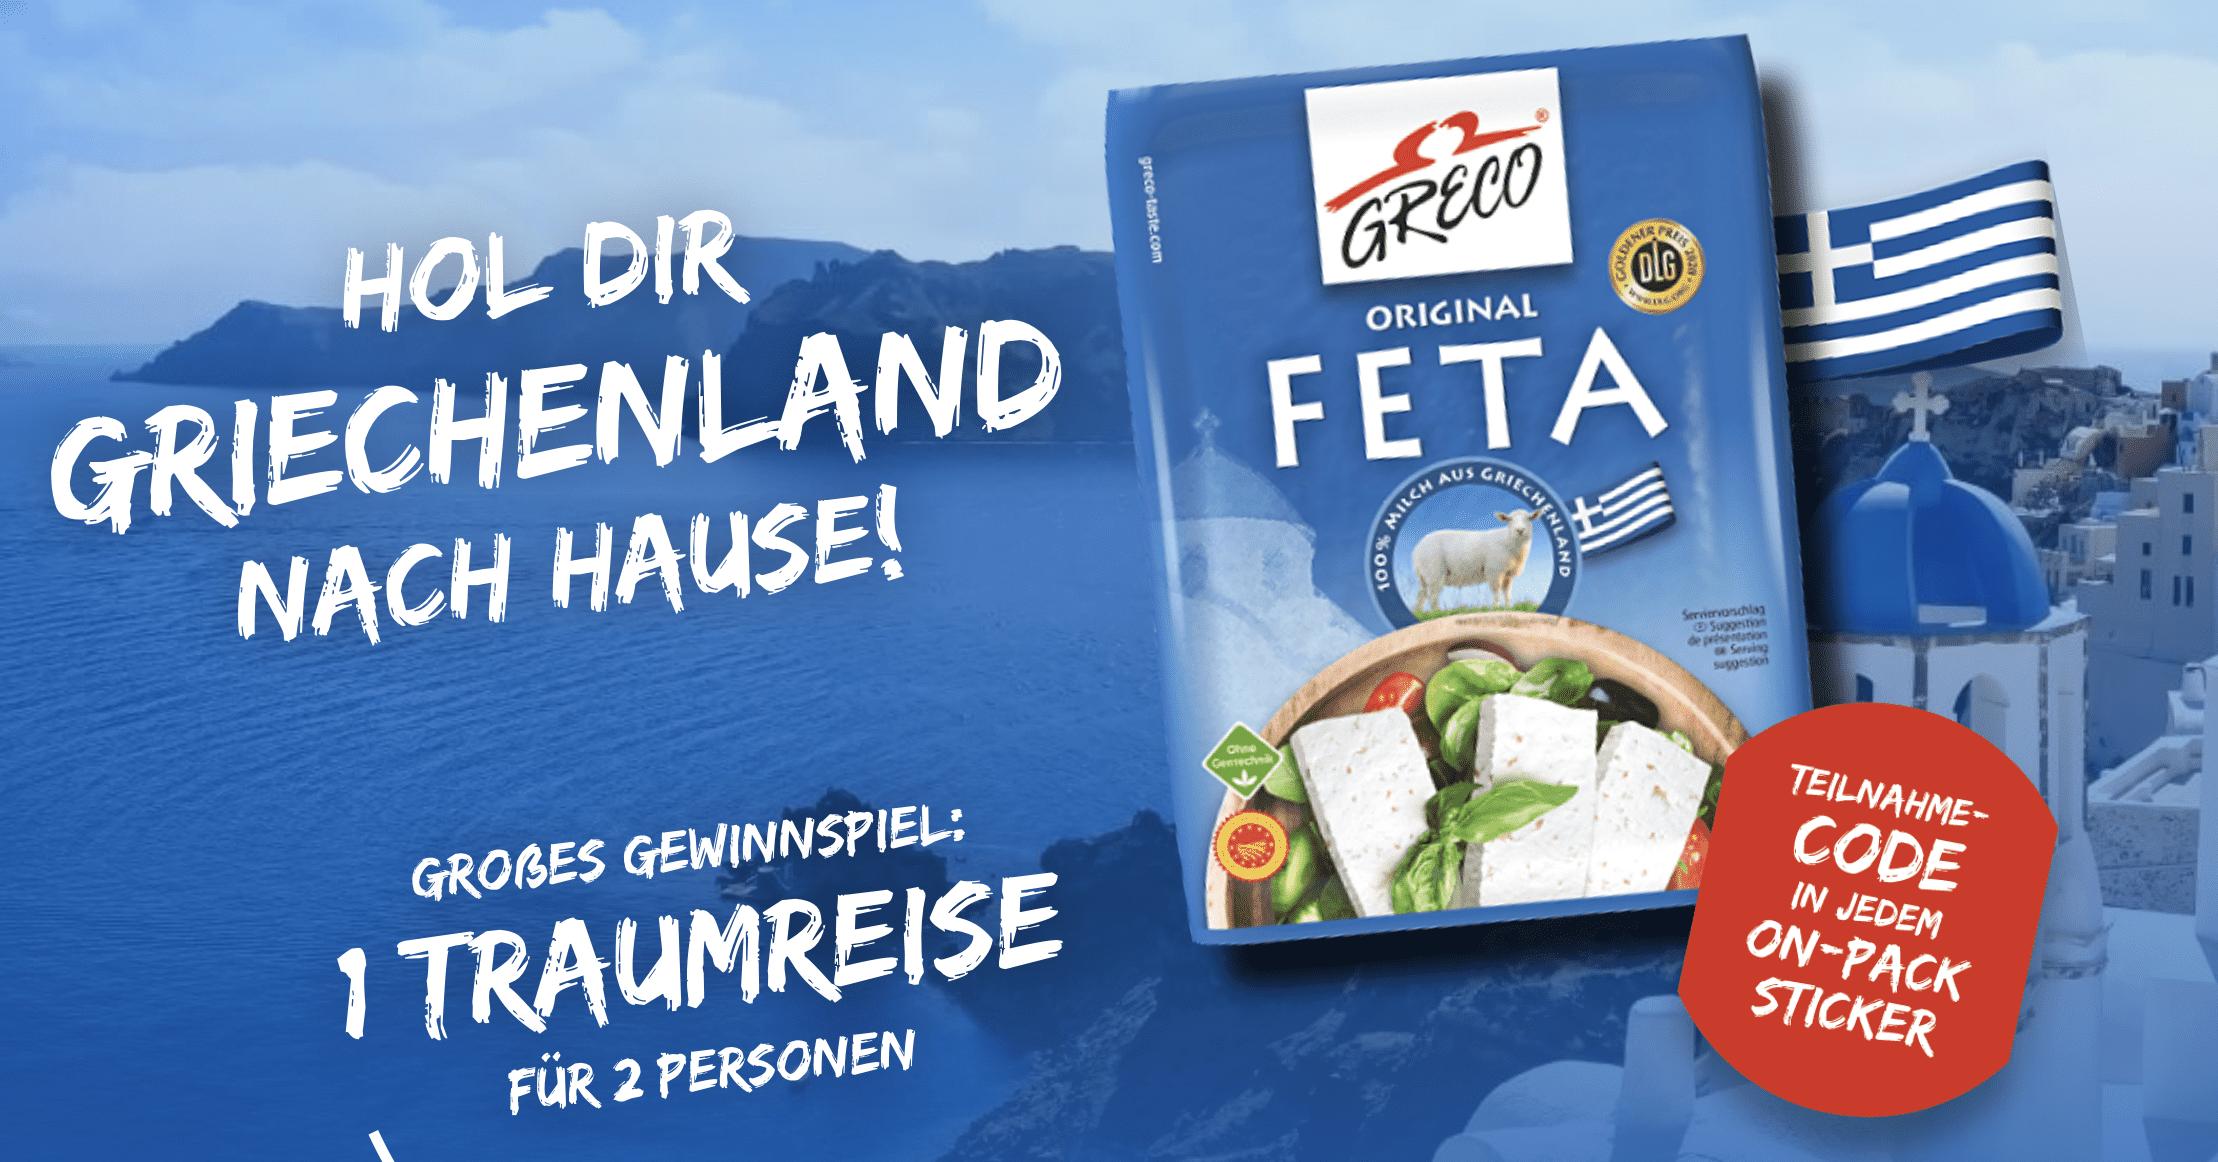 Gewinnspiel-Cases FMCG Food Greco